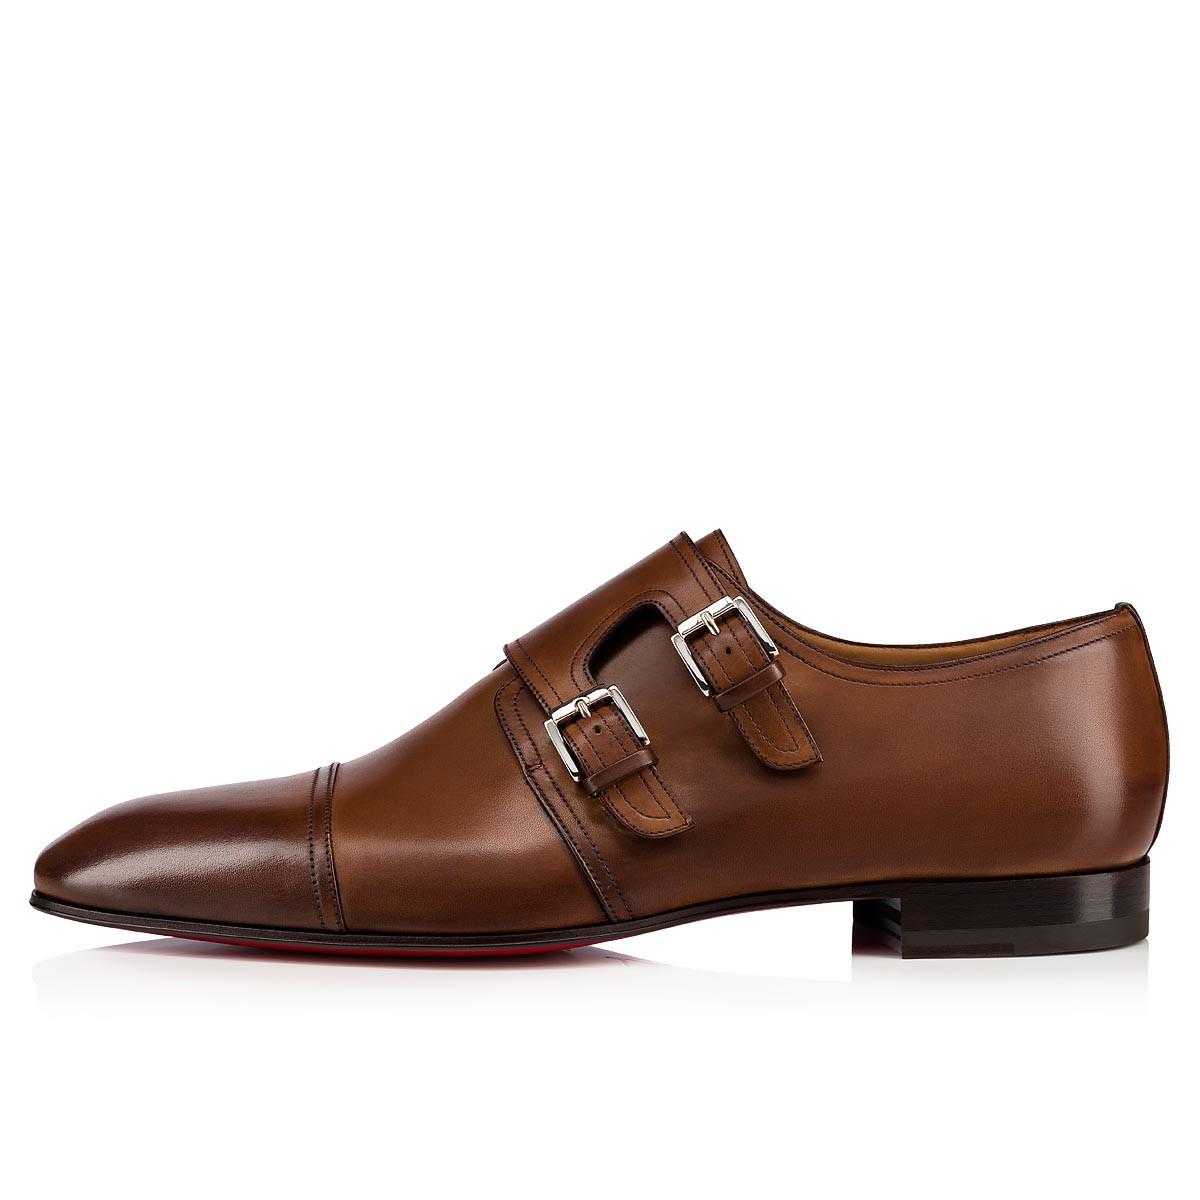 Shoes - Mortimer - Christian Louboutin